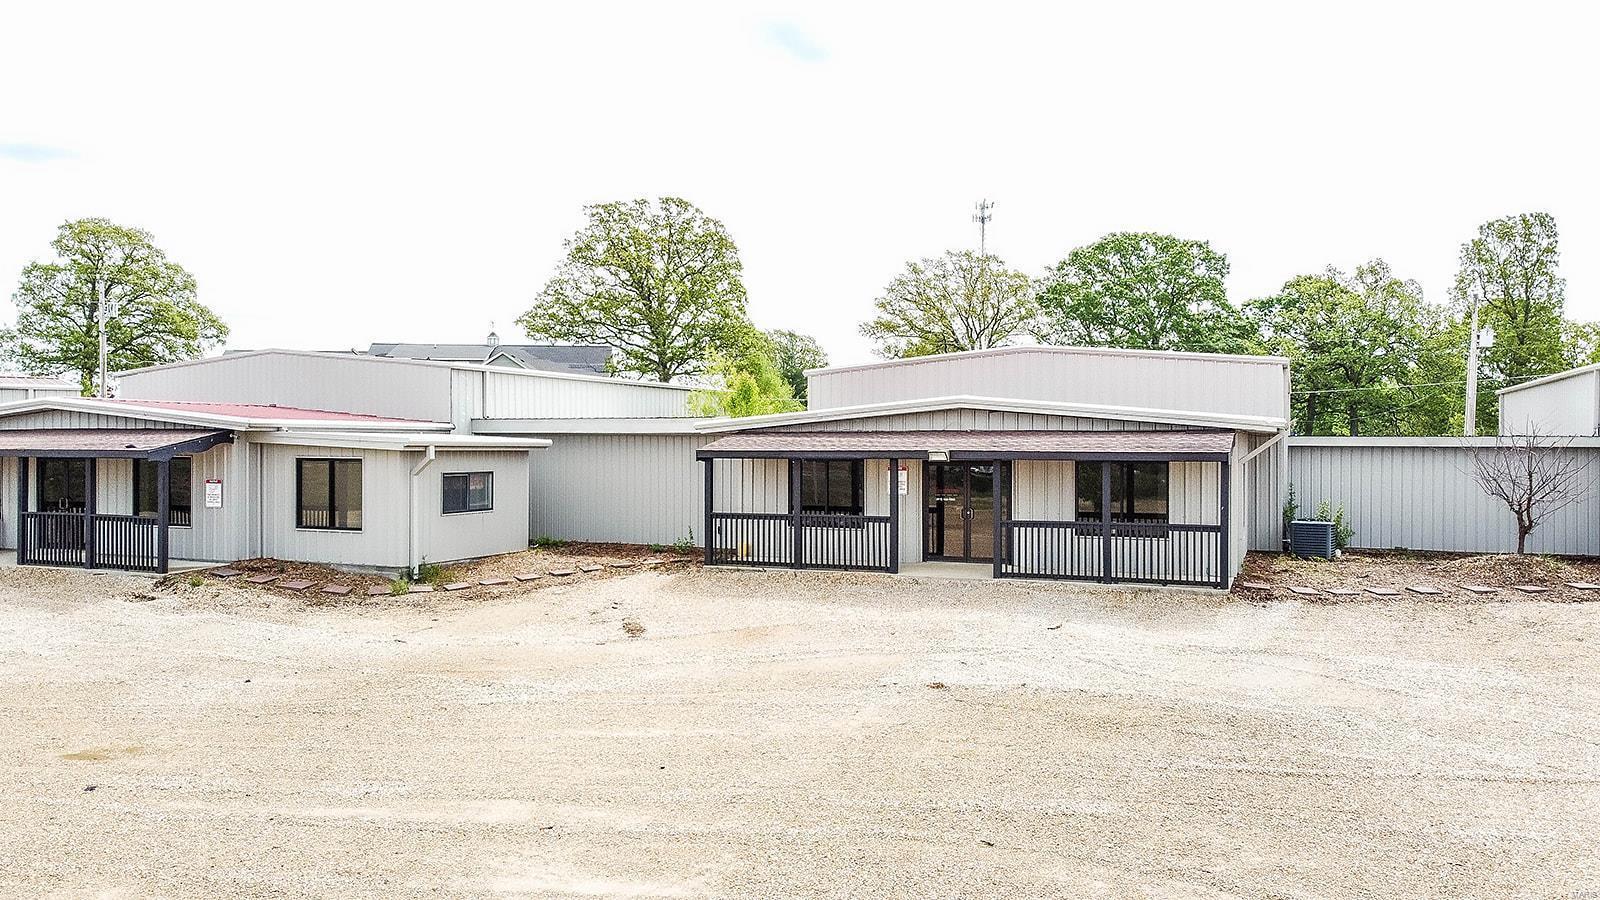 405 Schofer St Property Photo - Doolittle, MO real estate listing